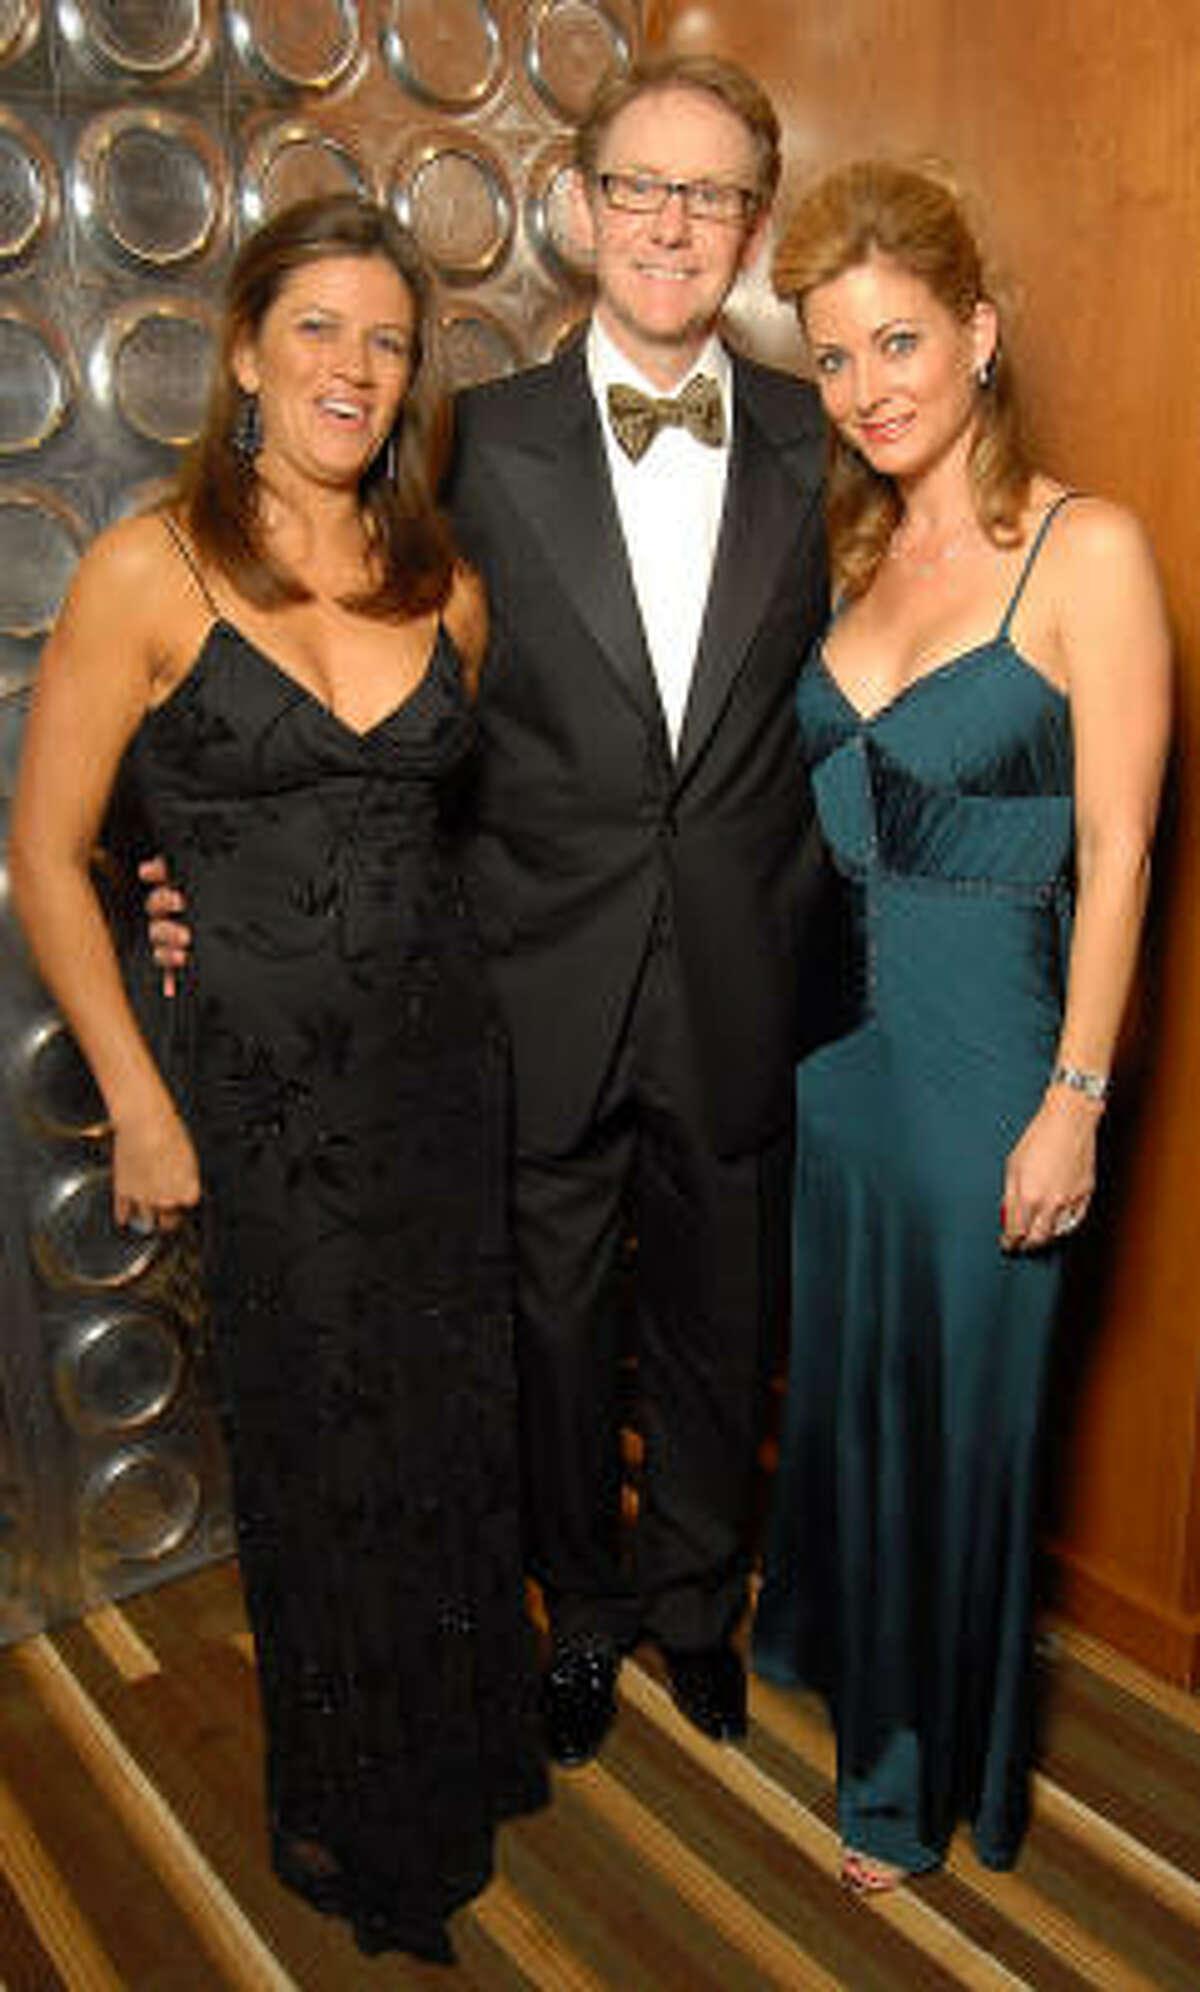 From left: Jessica Candela, Jeff Majewski and Karen Maley